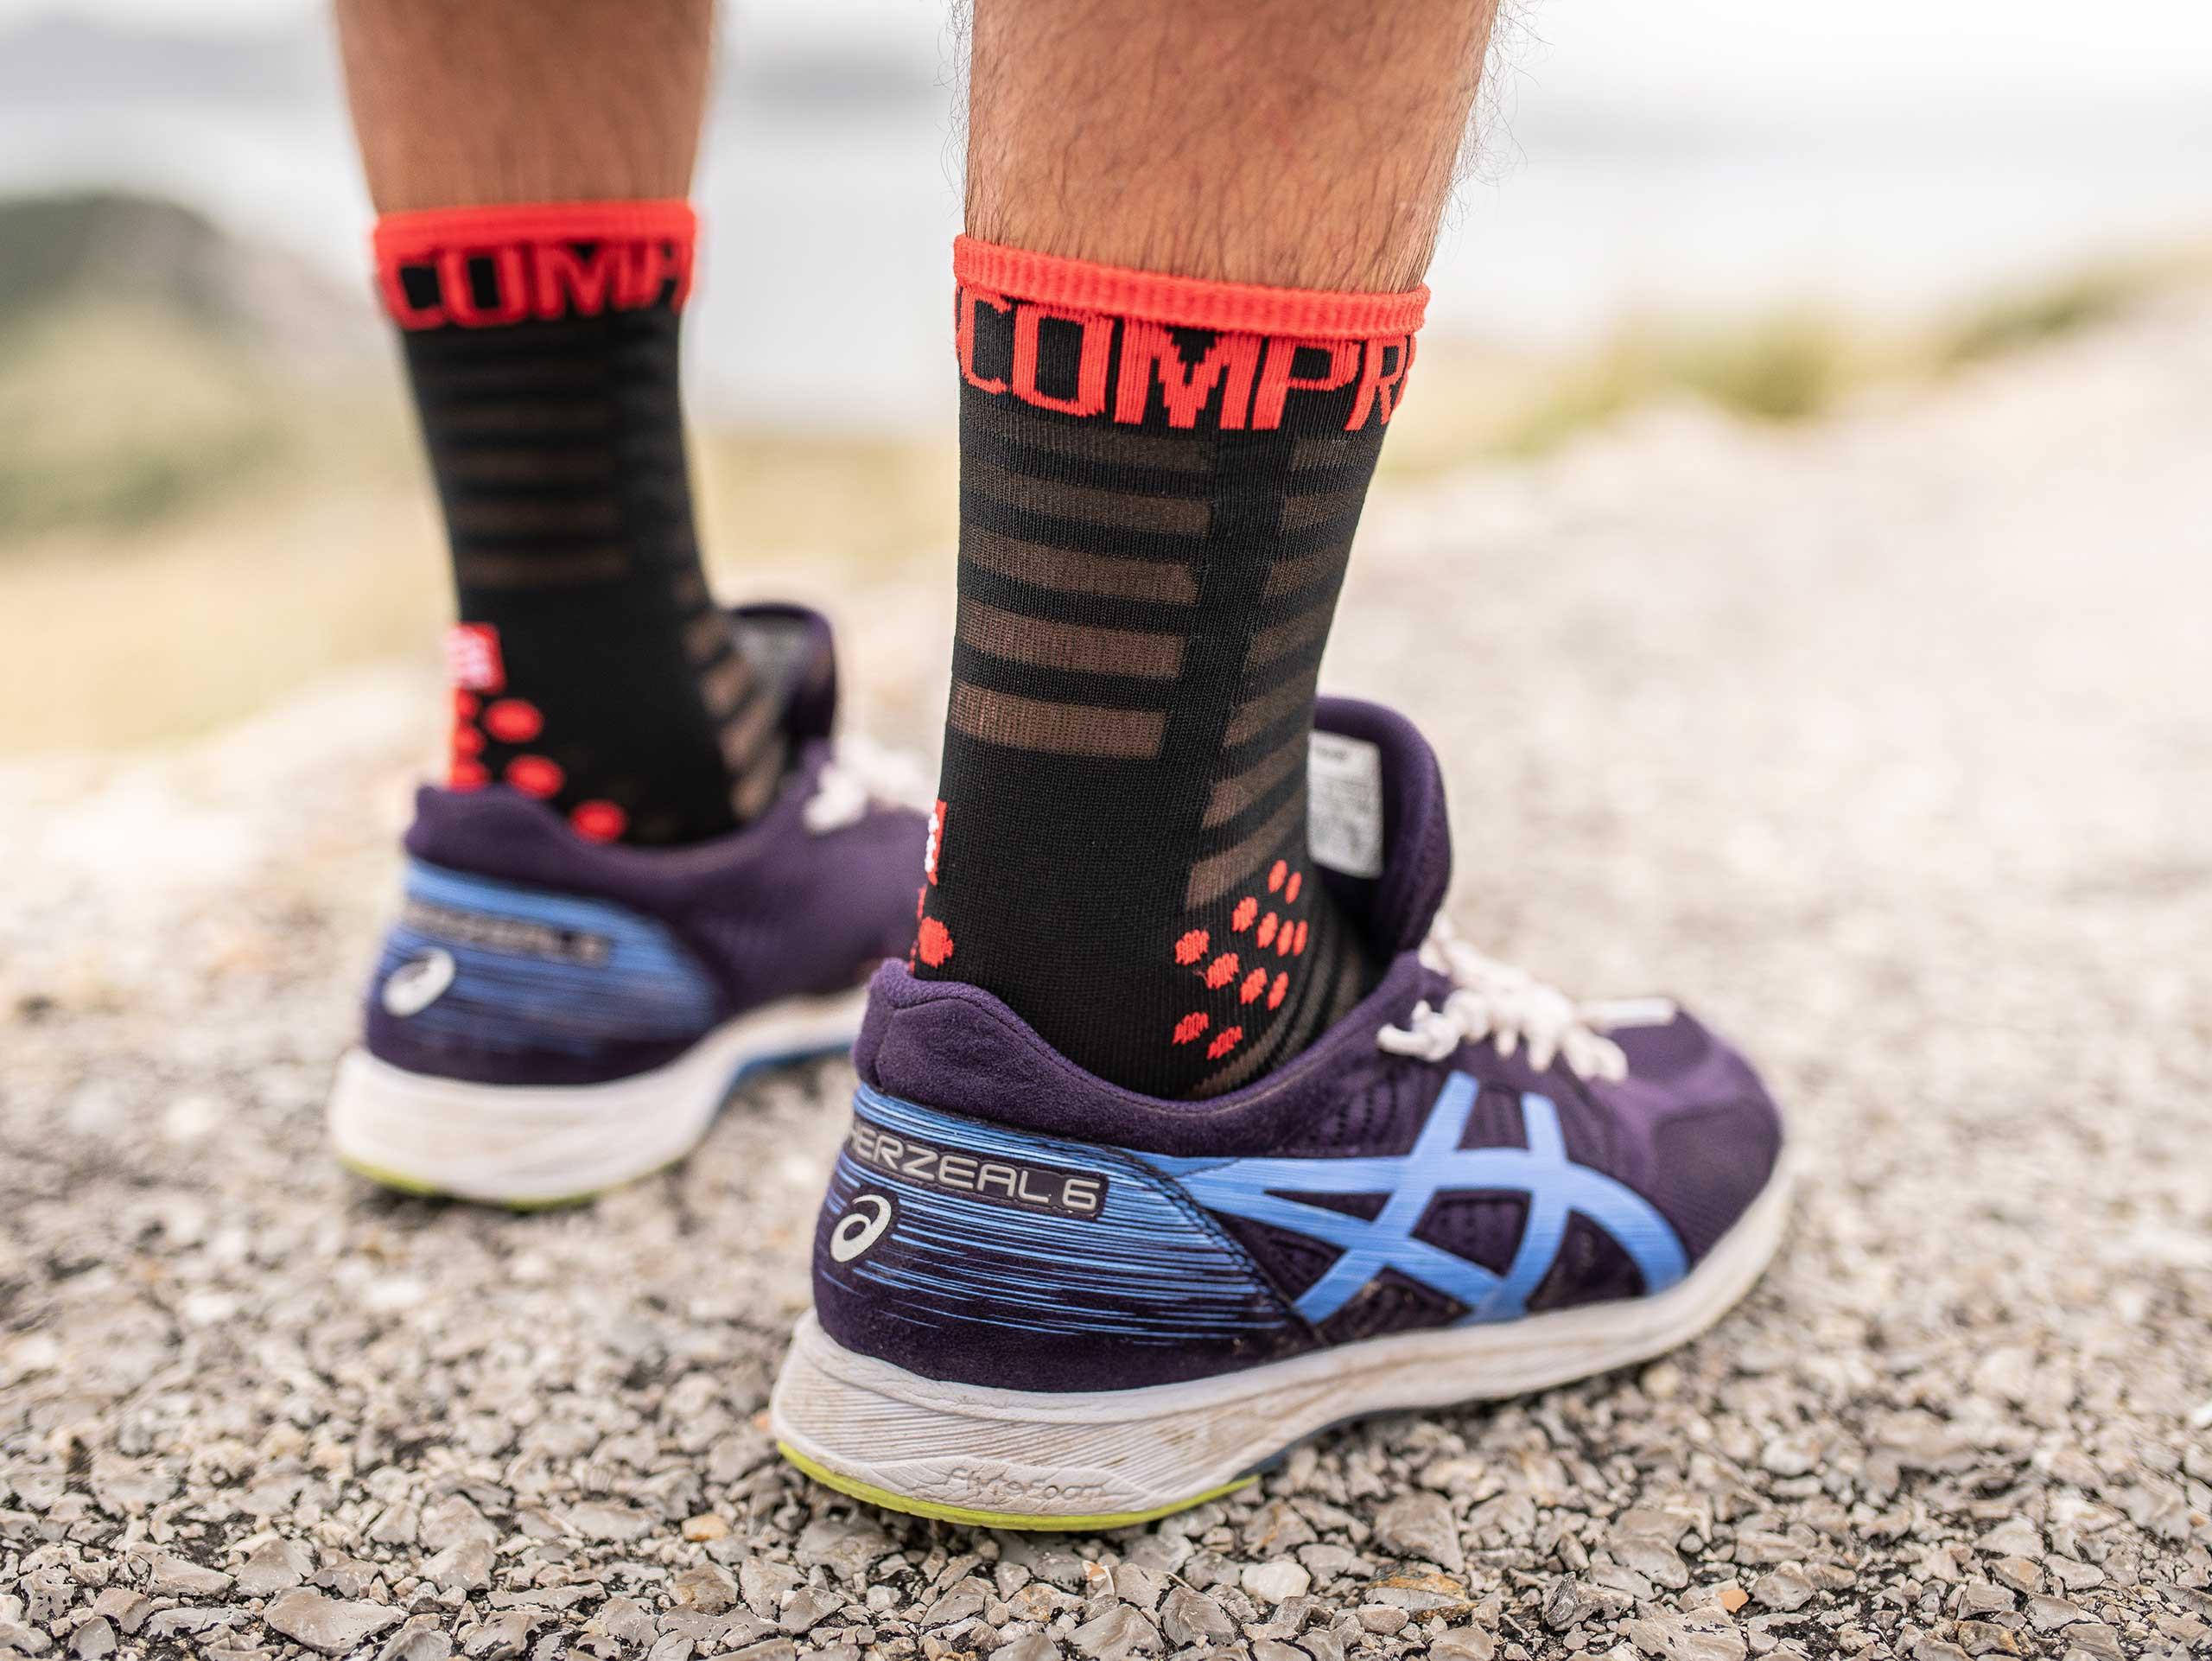 Pro Racing Socks v3.0 Ultralight Run High schwarz/rot